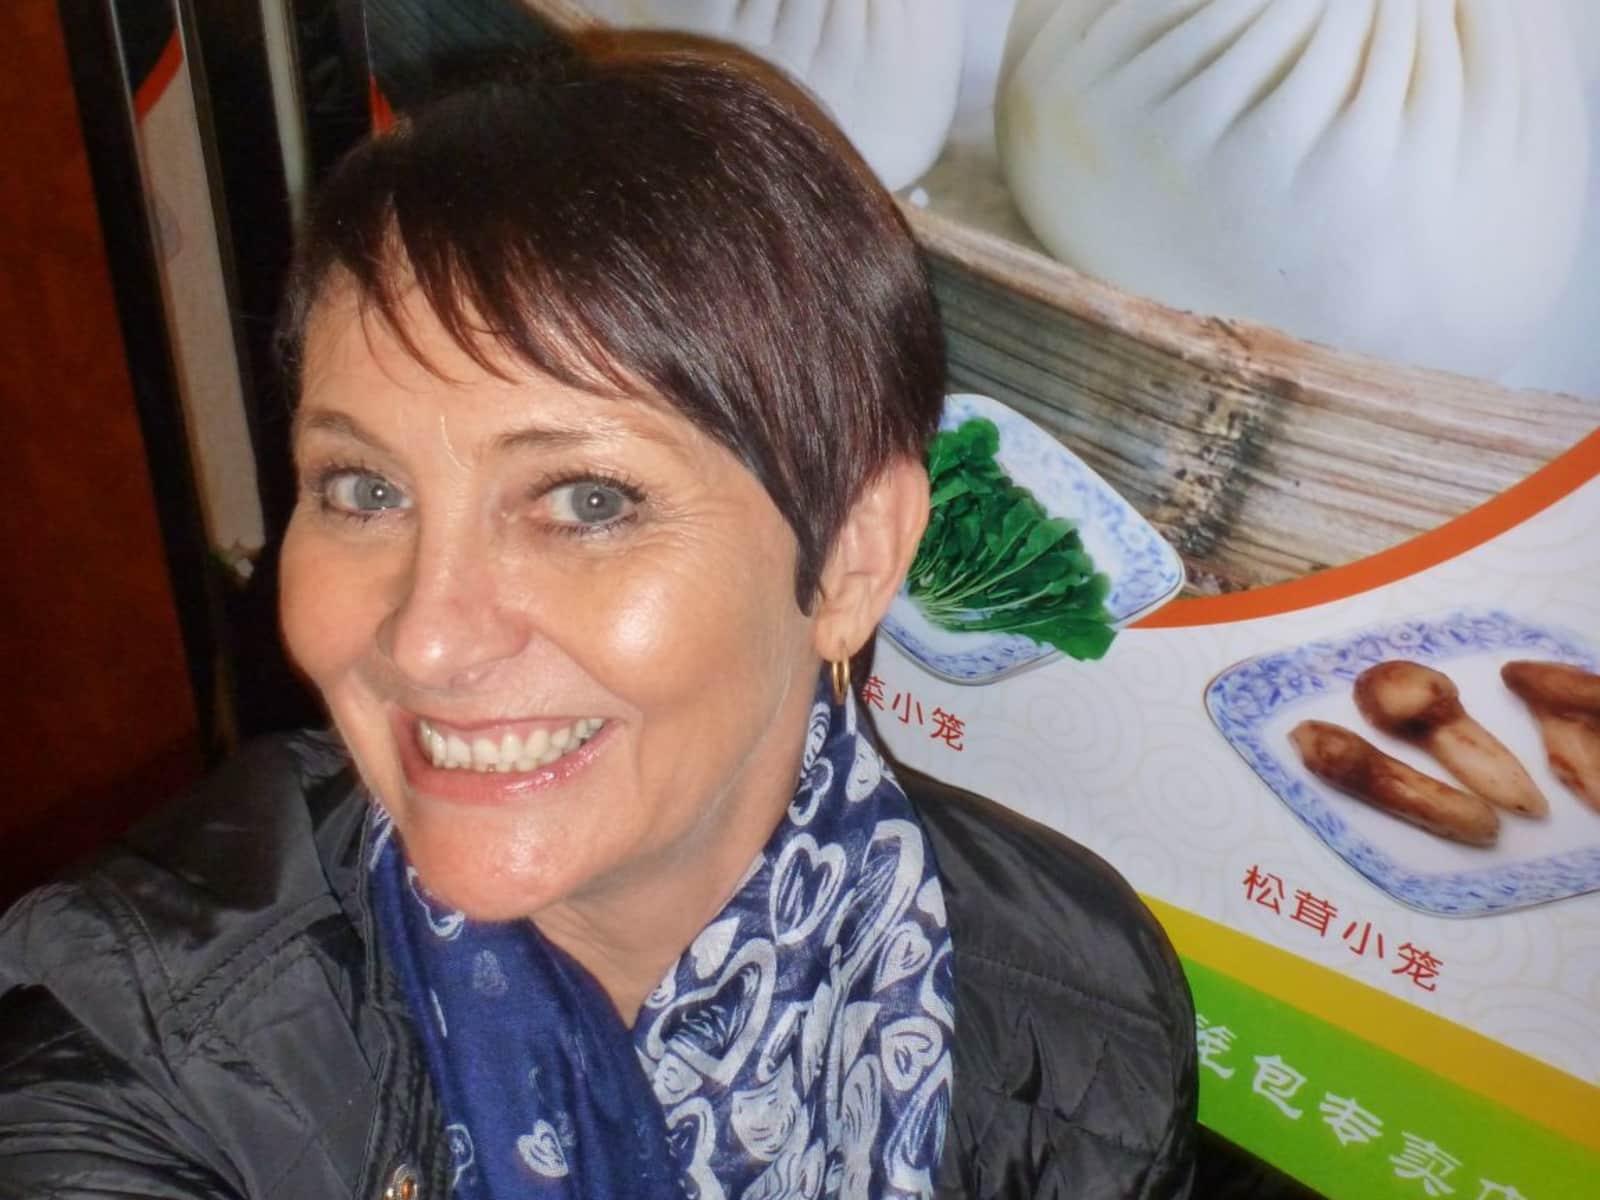 Glenda from Melbourne, Victoria, Australia